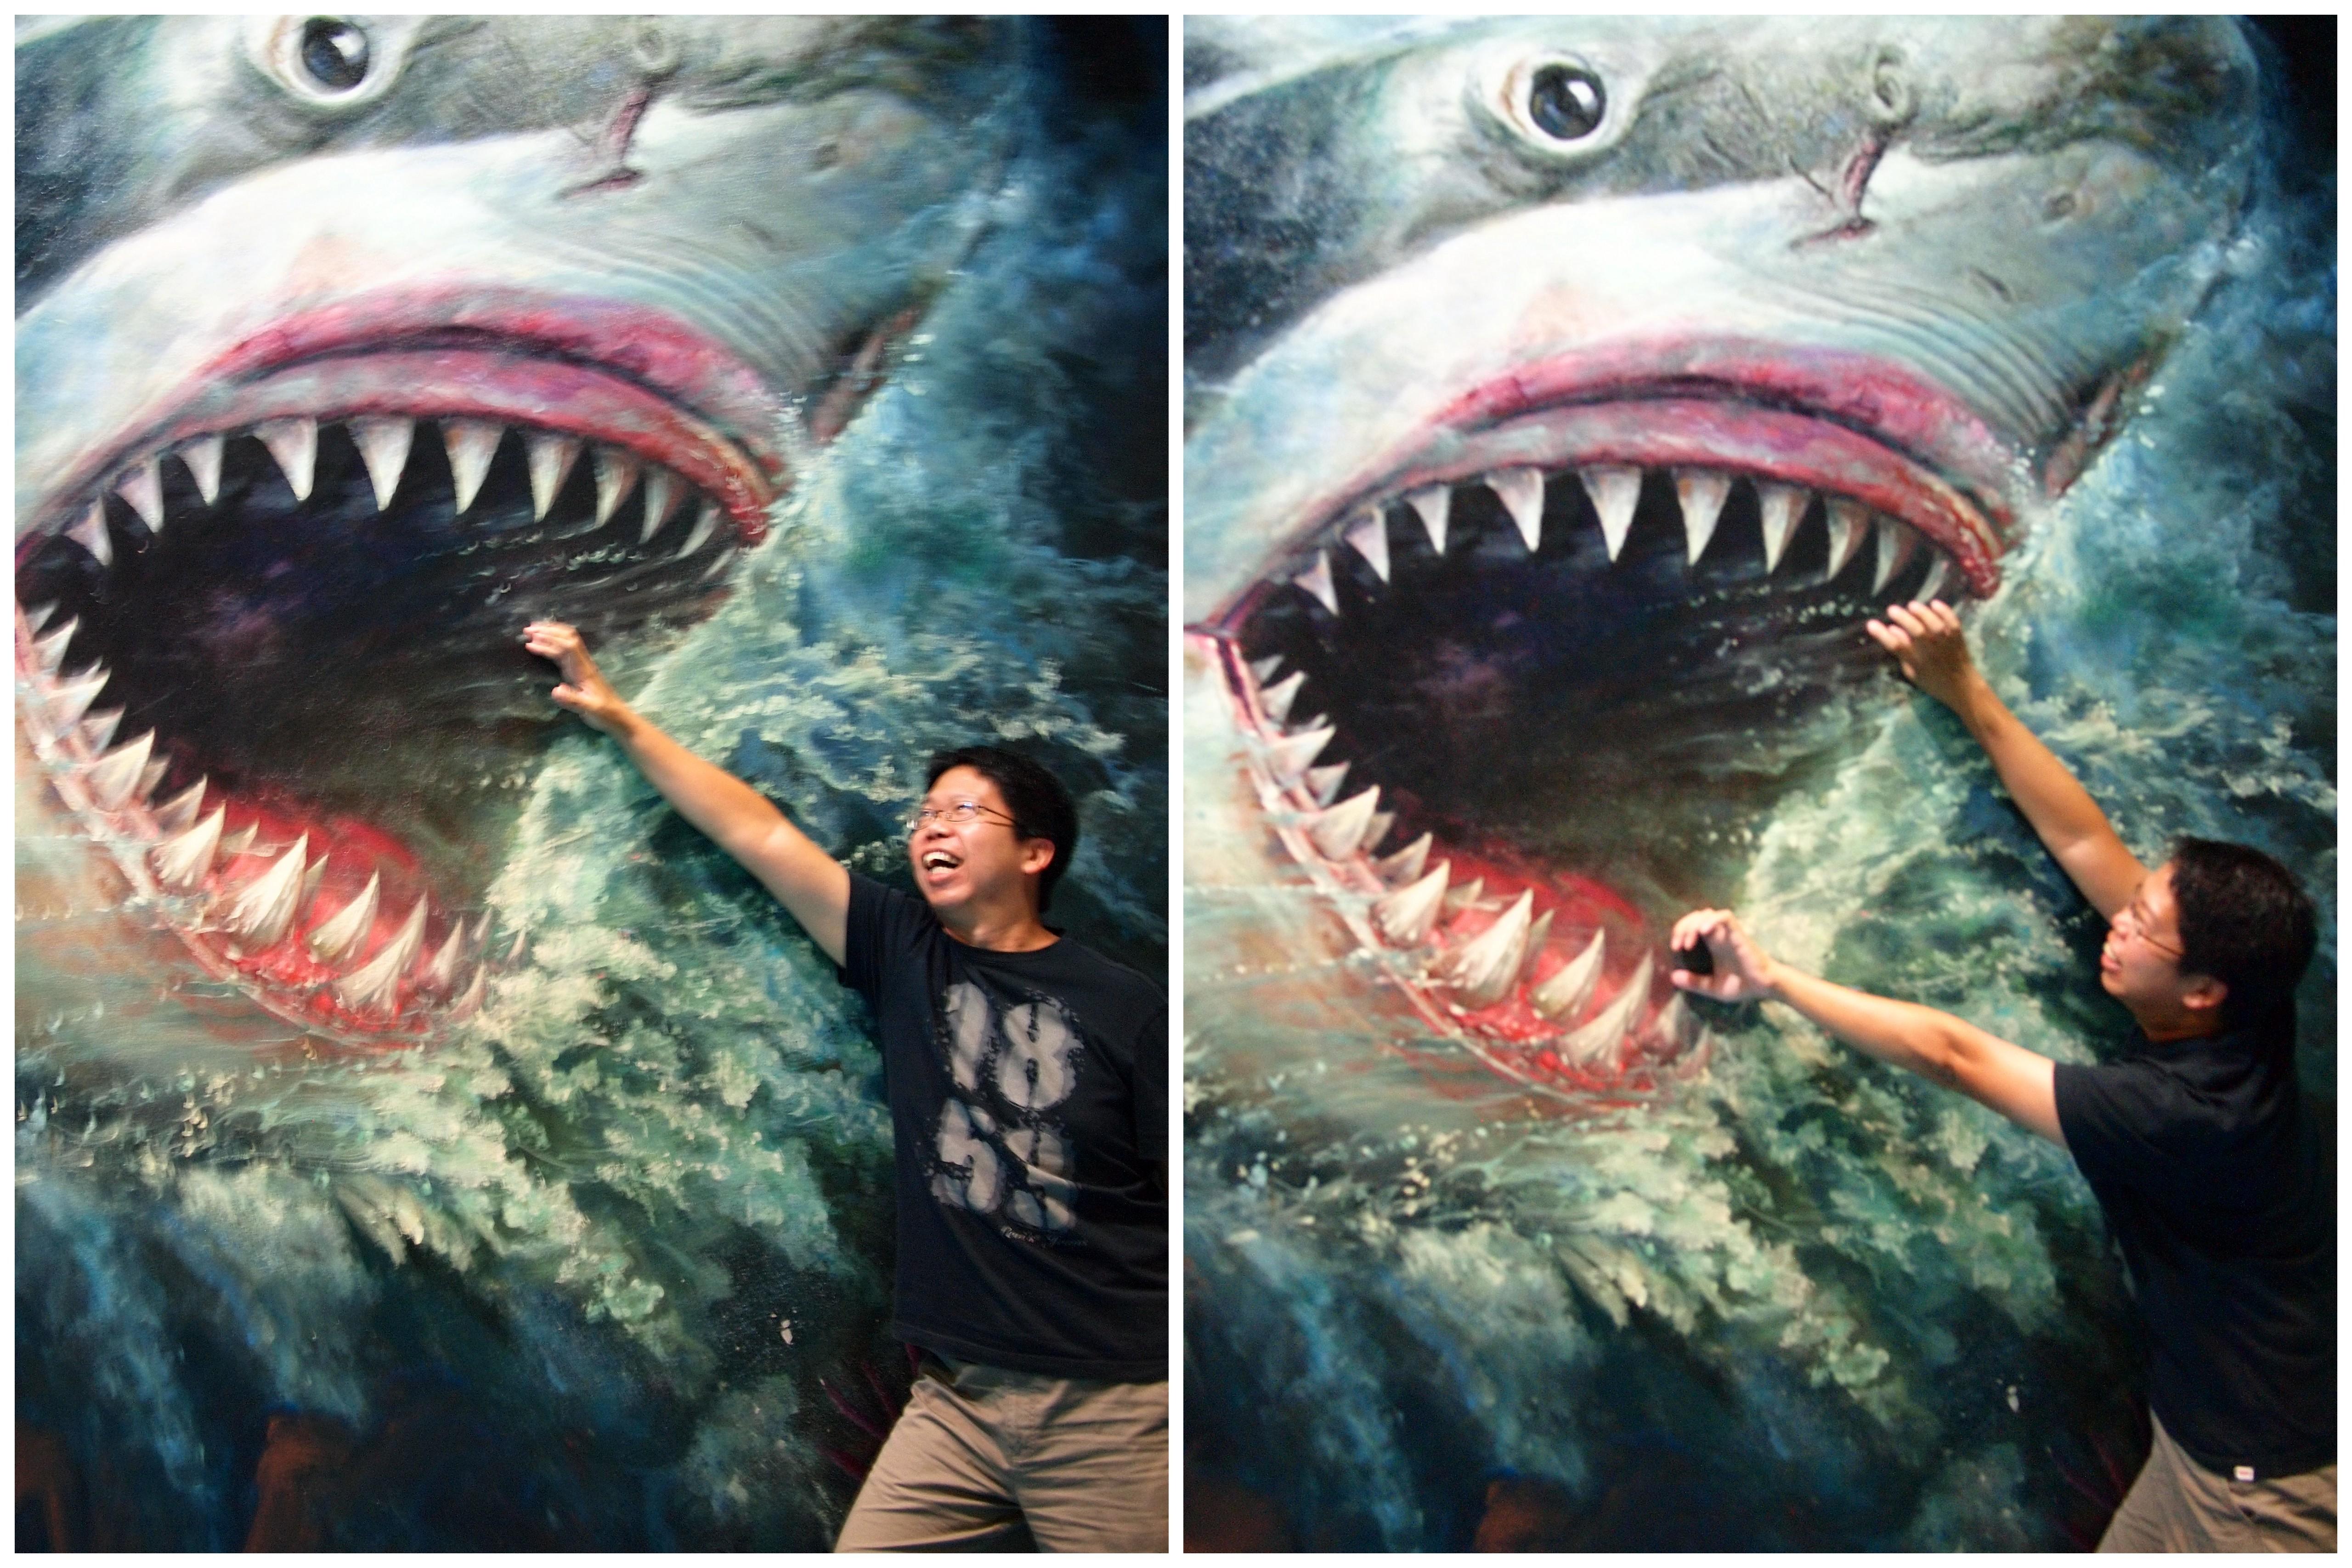 3D Art - Art gallery - things to do in Pattaya